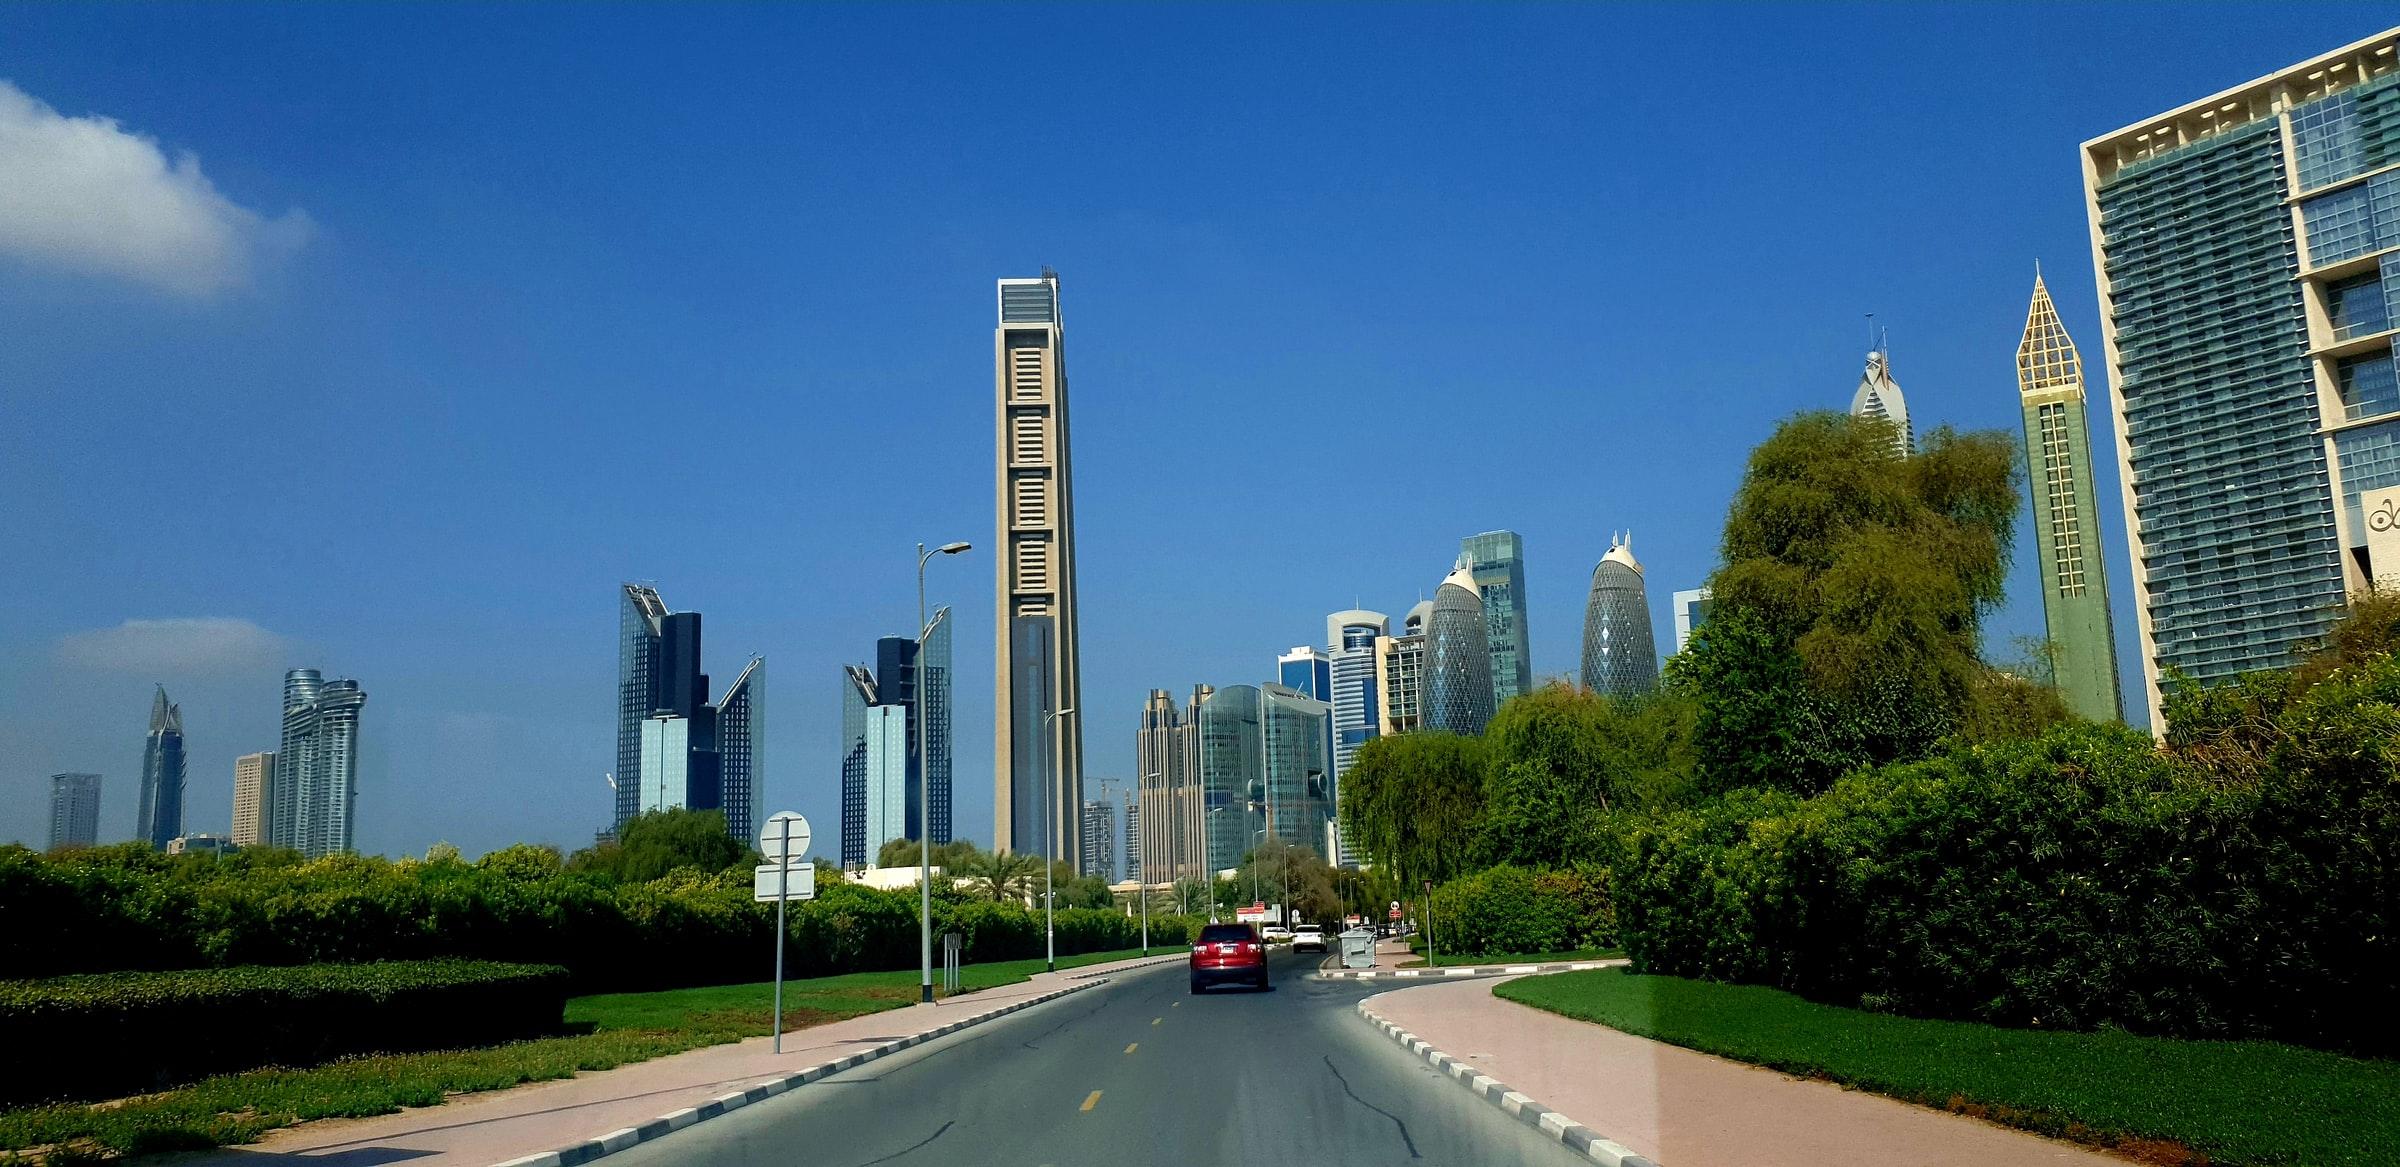 A Guide to Dubai: A City of Contrasts